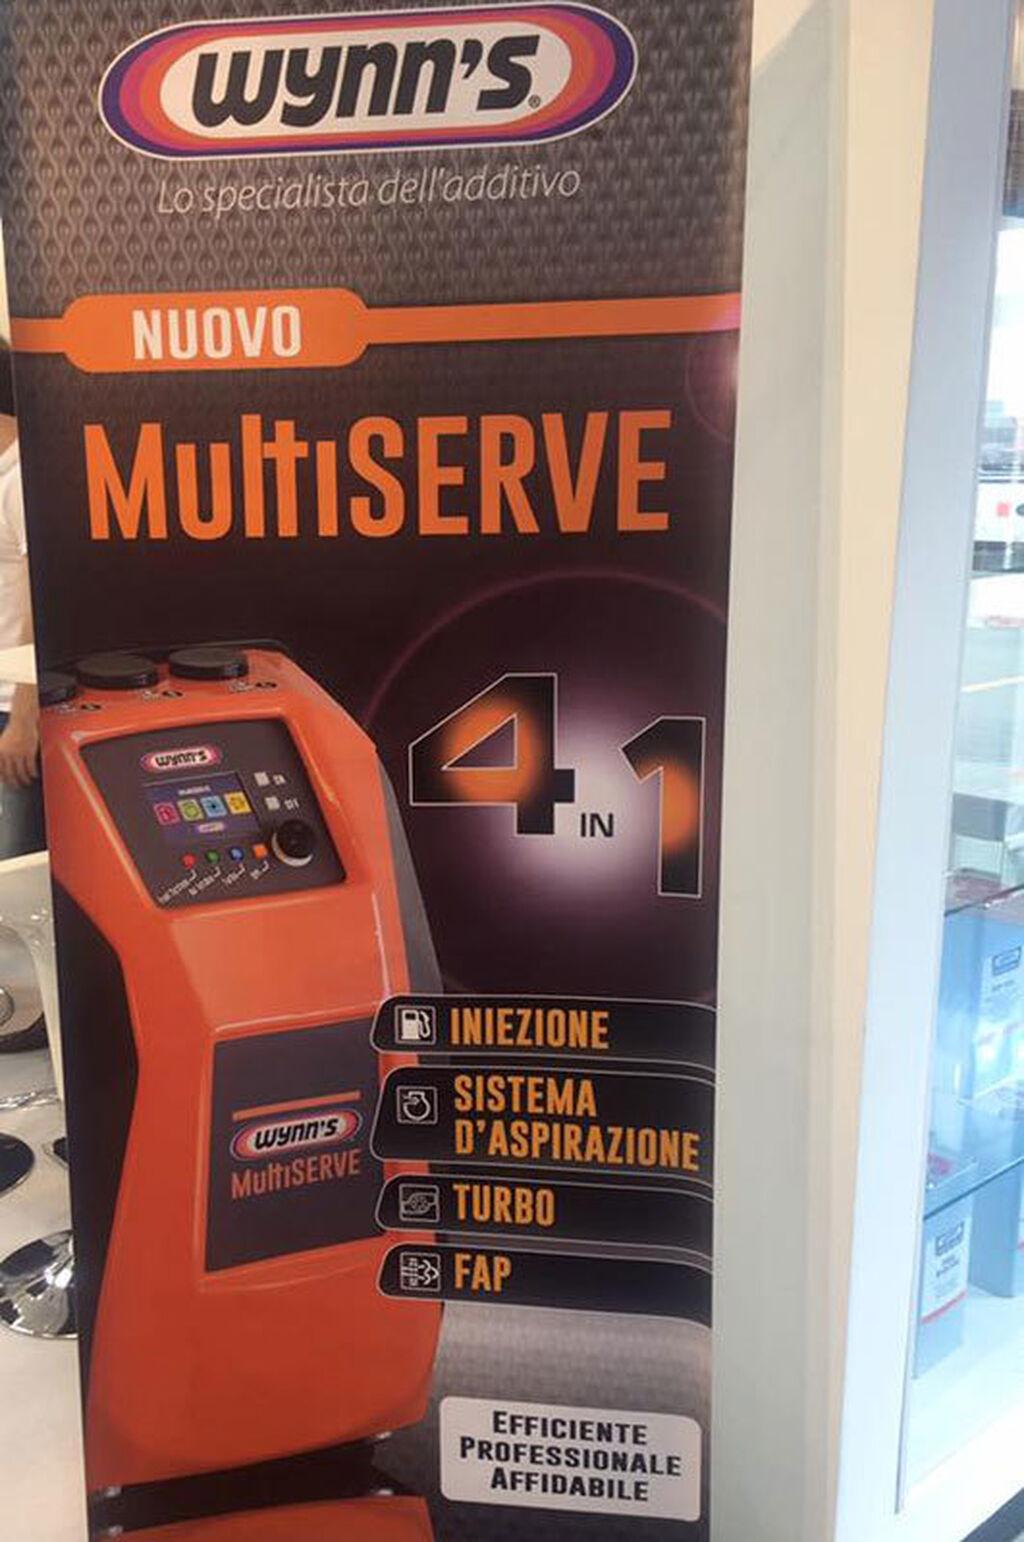 La máquina Multiserve de Winn's, entre las novedades de la feria.